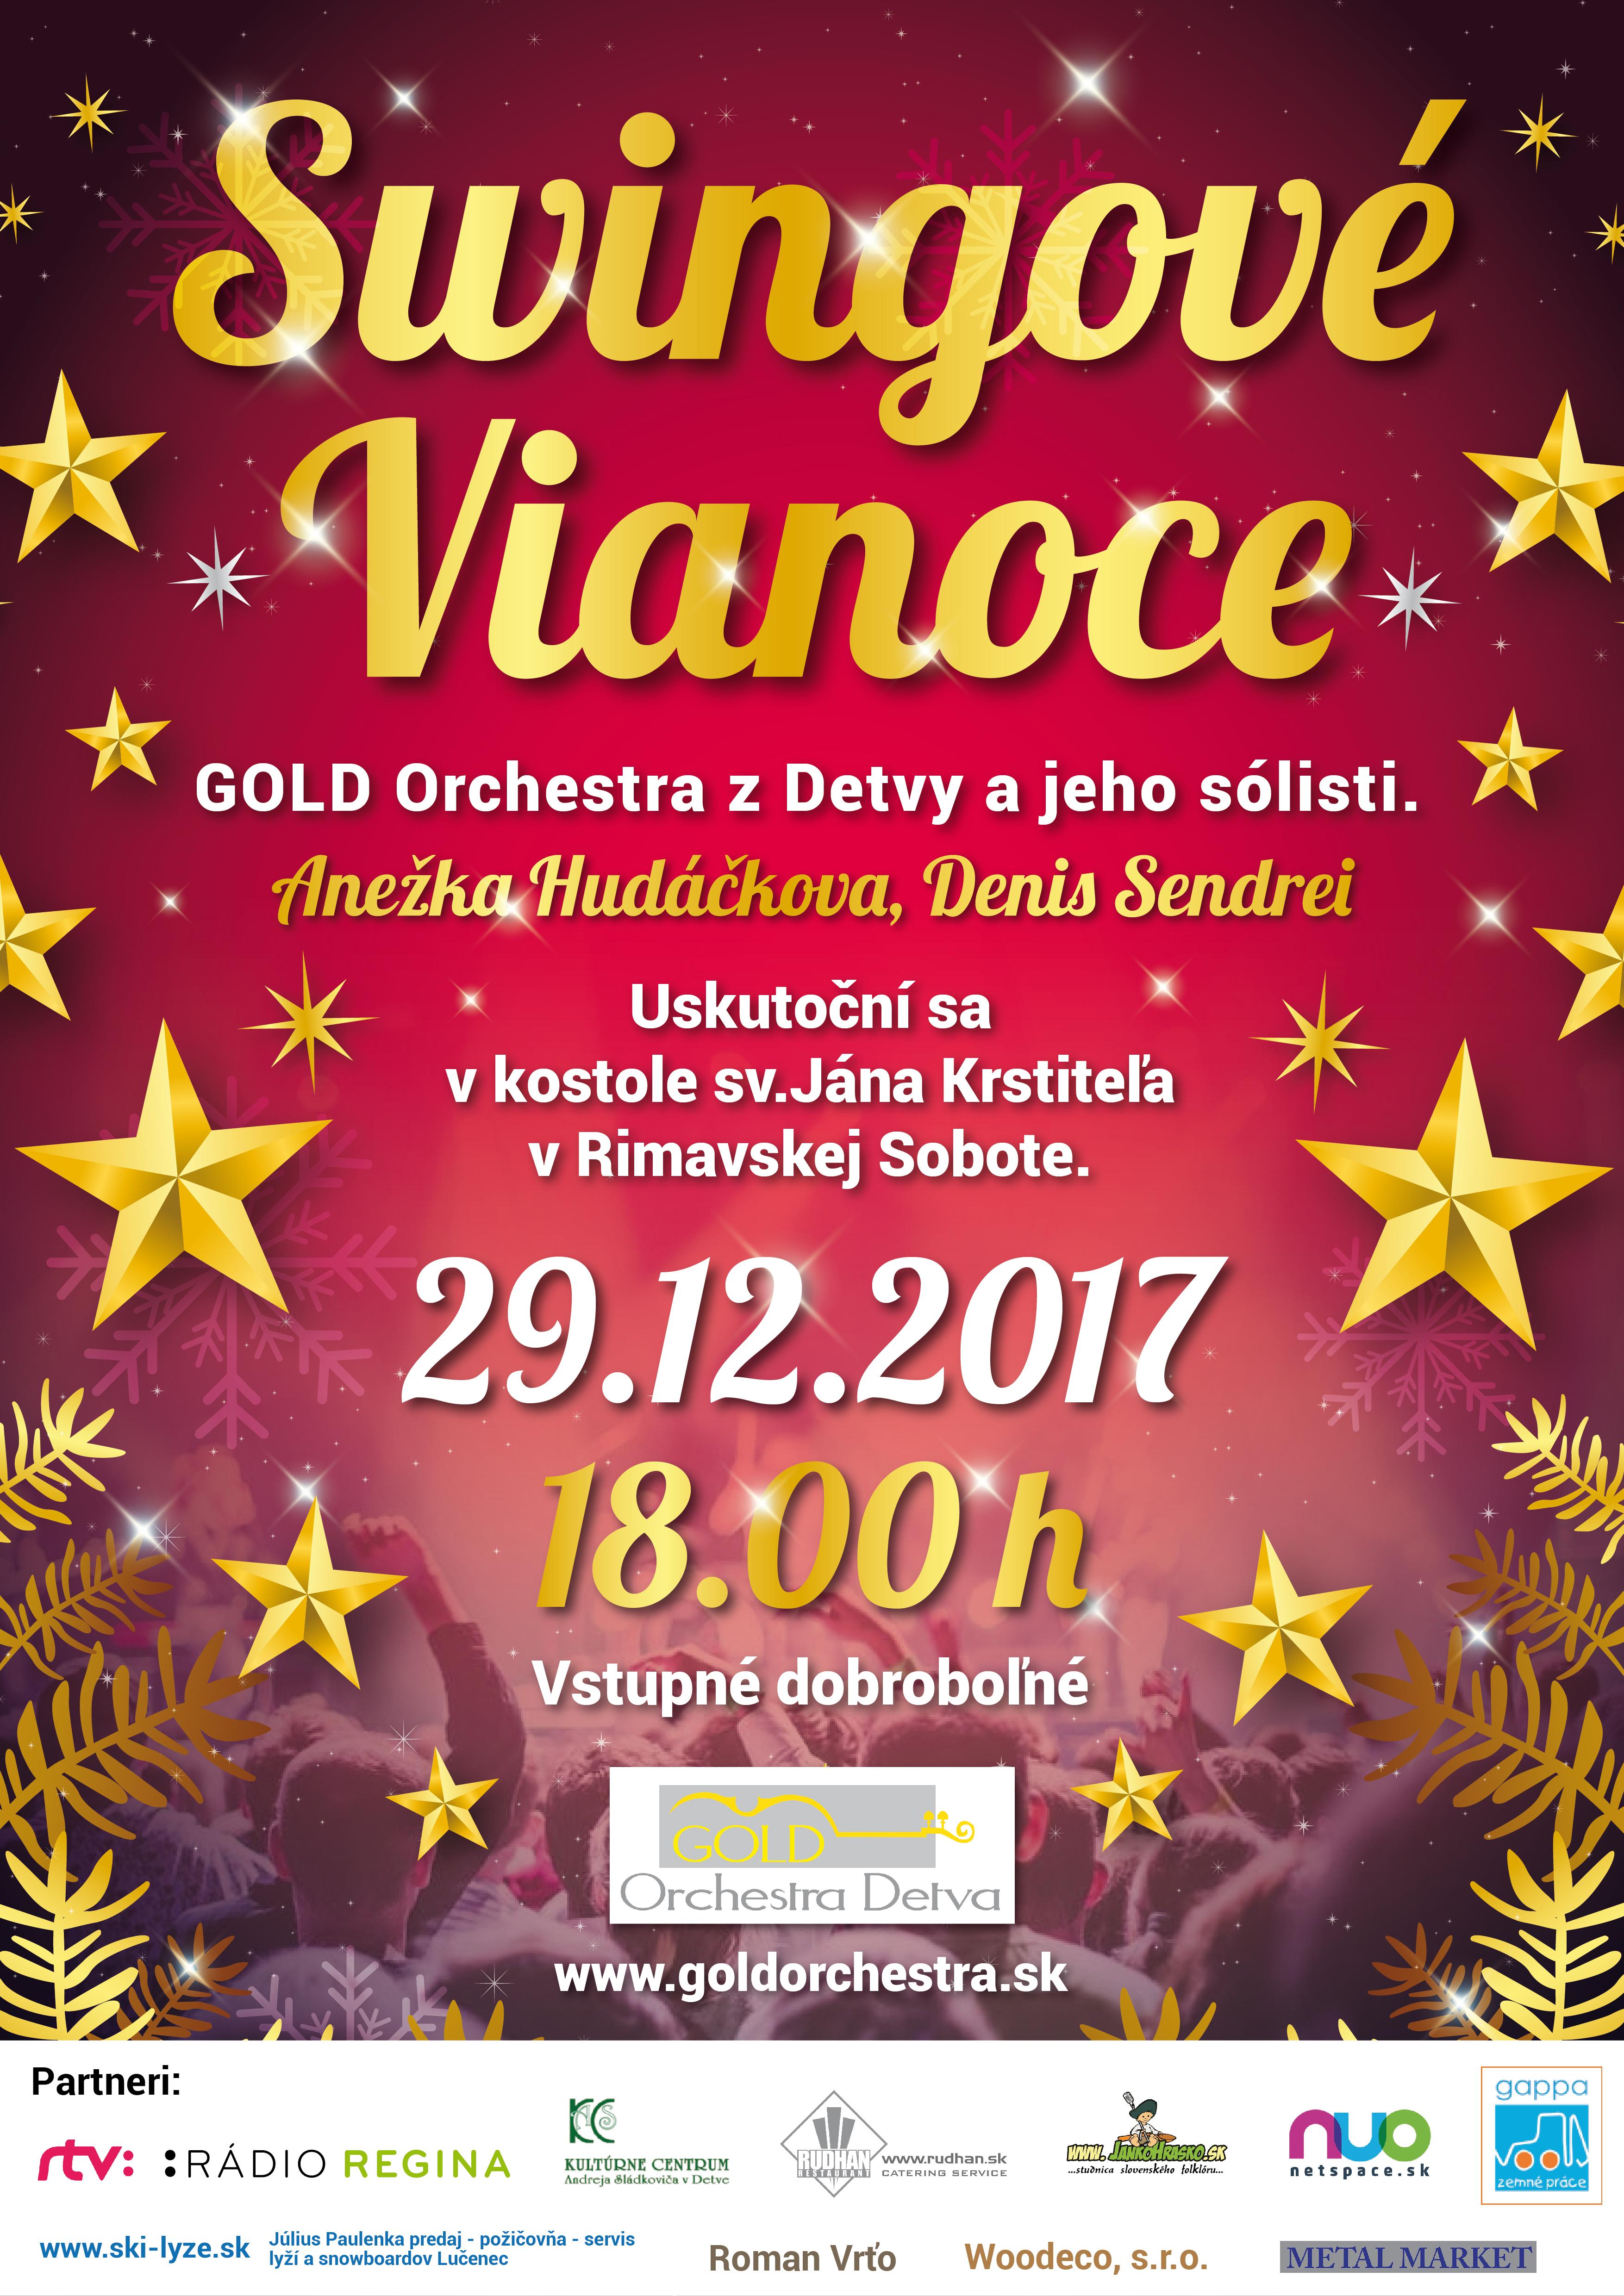 Swingové Vianoce - koncert @ Kostol sv.Jána Krstiteľa v Rimavskej Sobote | Banskobystrický kraj | Slovensko